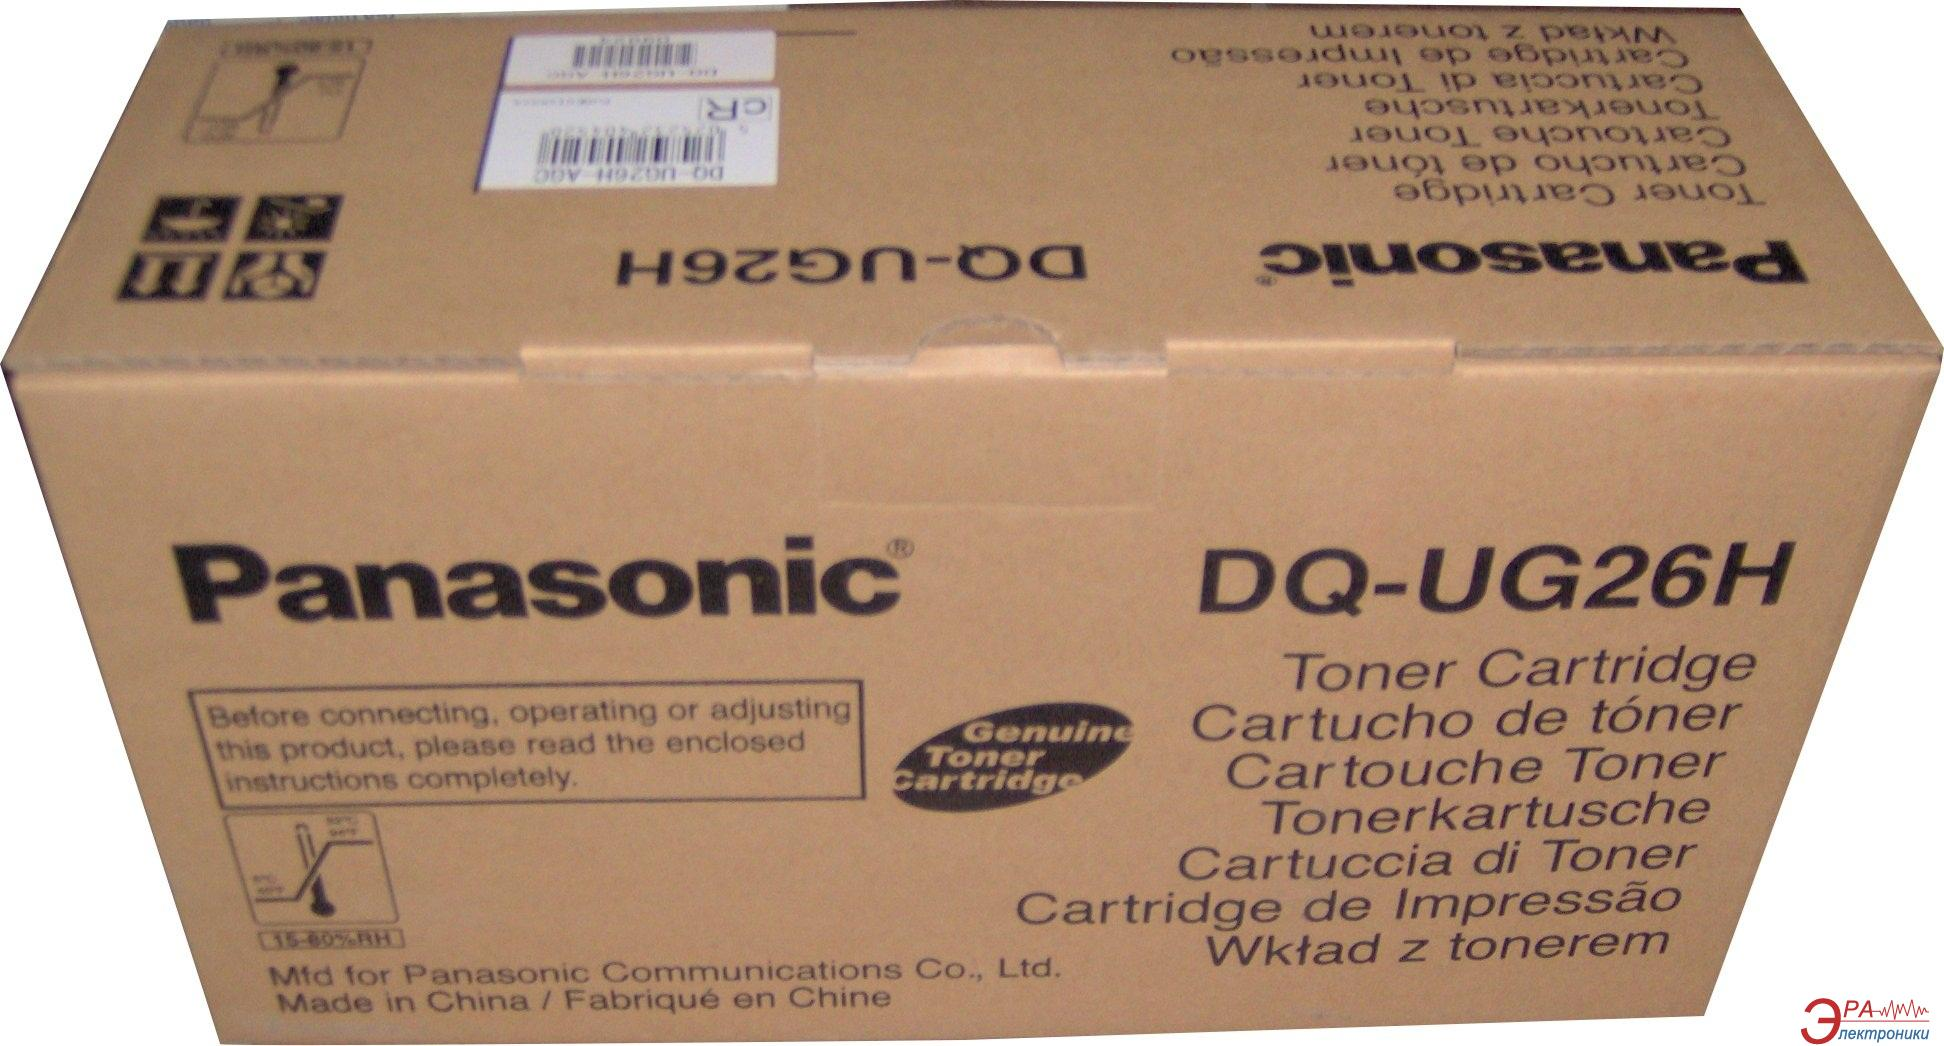 Тонер картридж Panasonic DQ-UG26H-AGC black